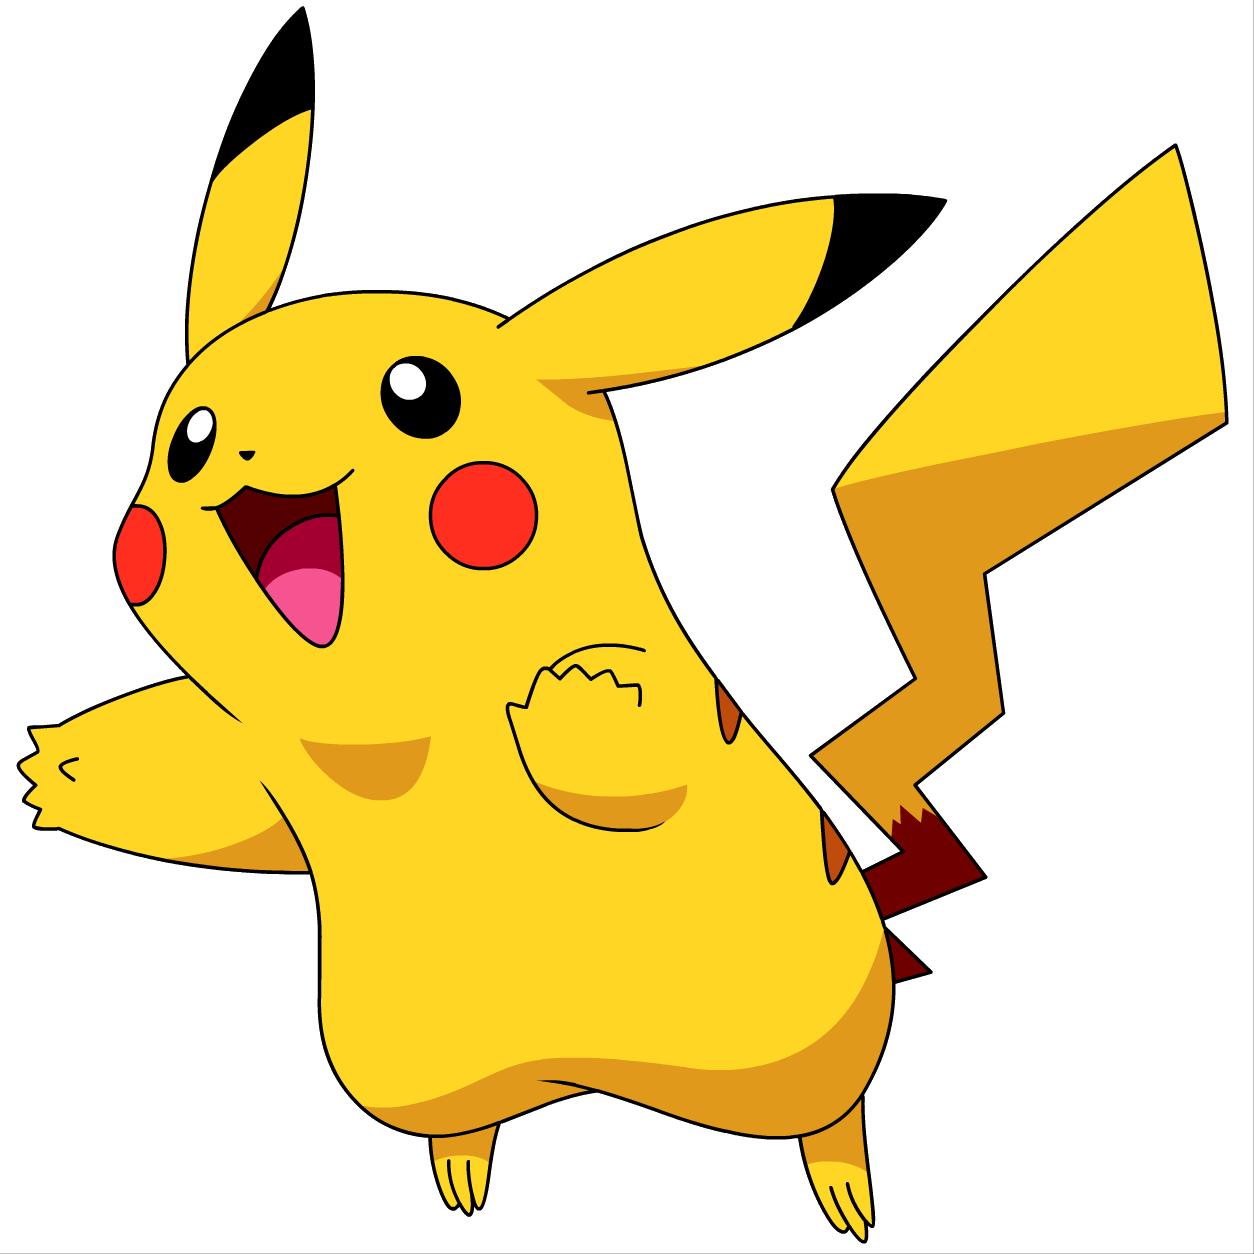 Pokemon Png Image Pikachu Pikachu Wallpaper Pikachu Plushie